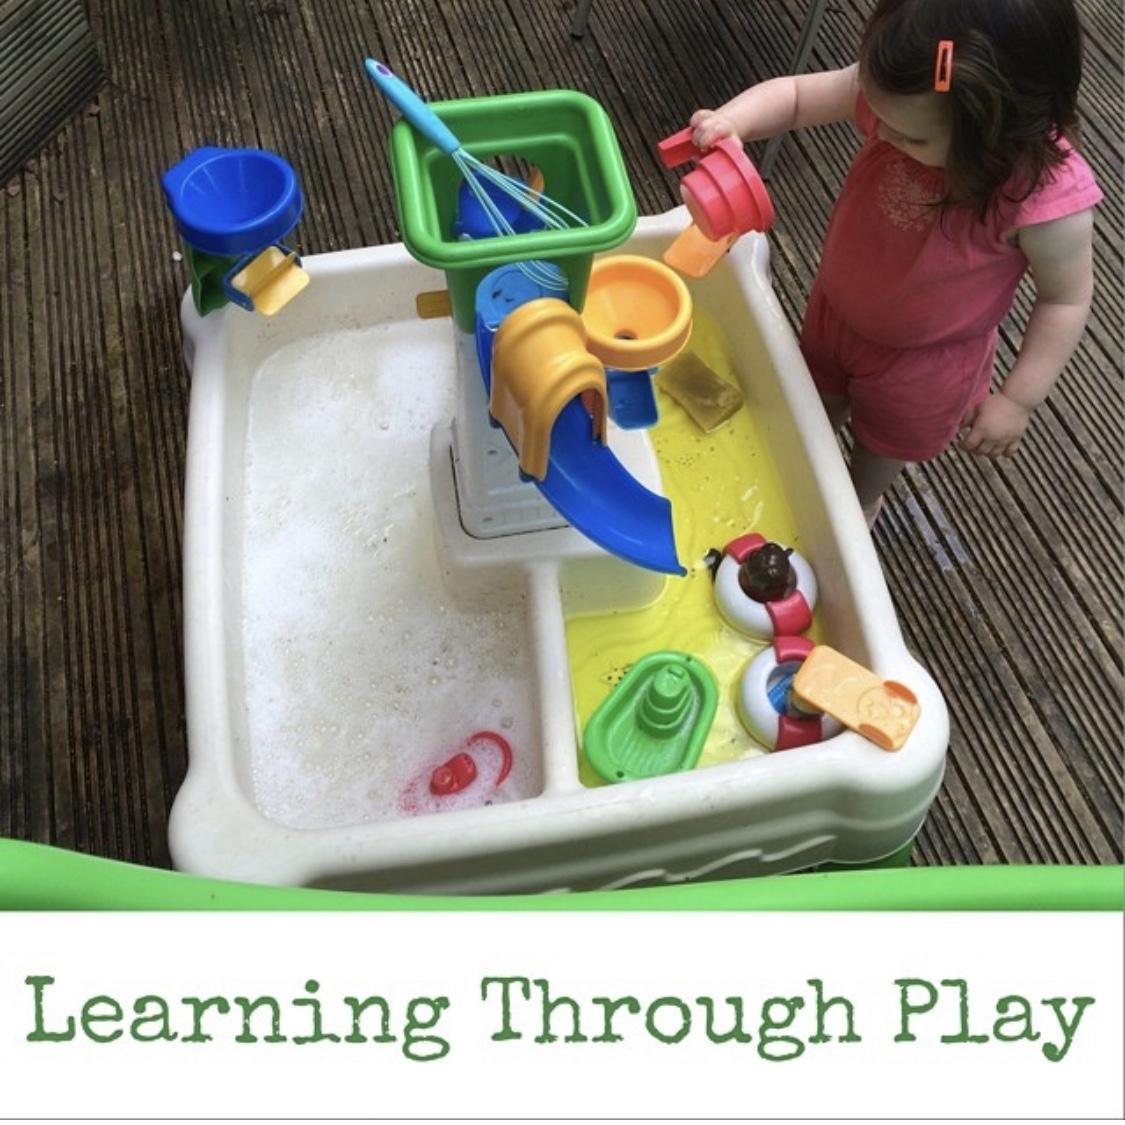 free ideas for Summer fun - clean the garden toys